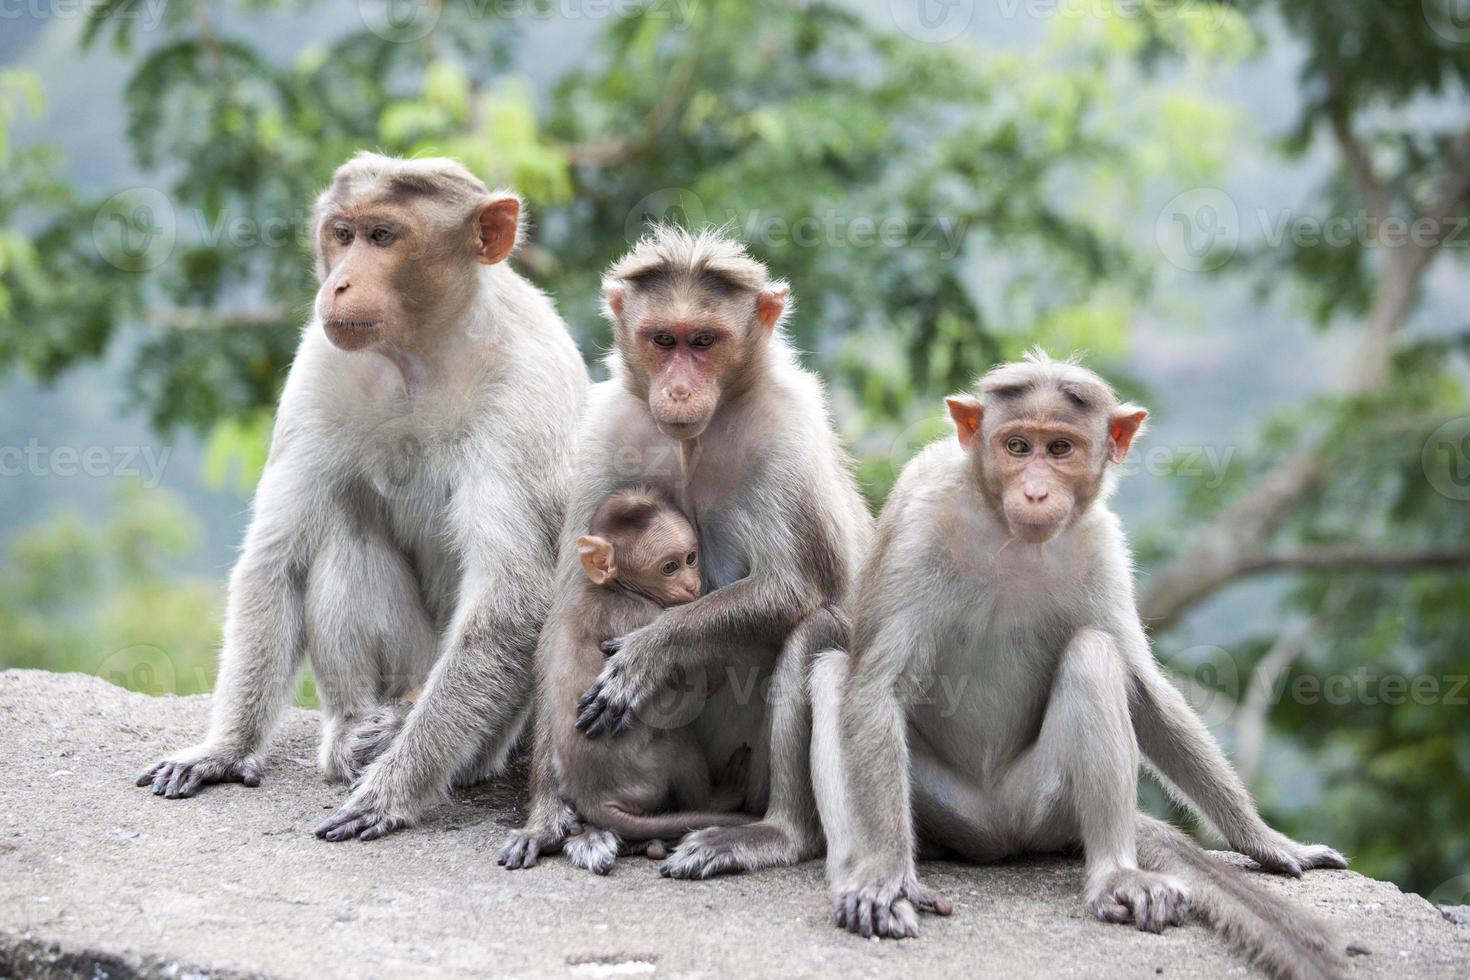 famiglia di macachi rhesus seduto vicino a un'autostrada in india foto